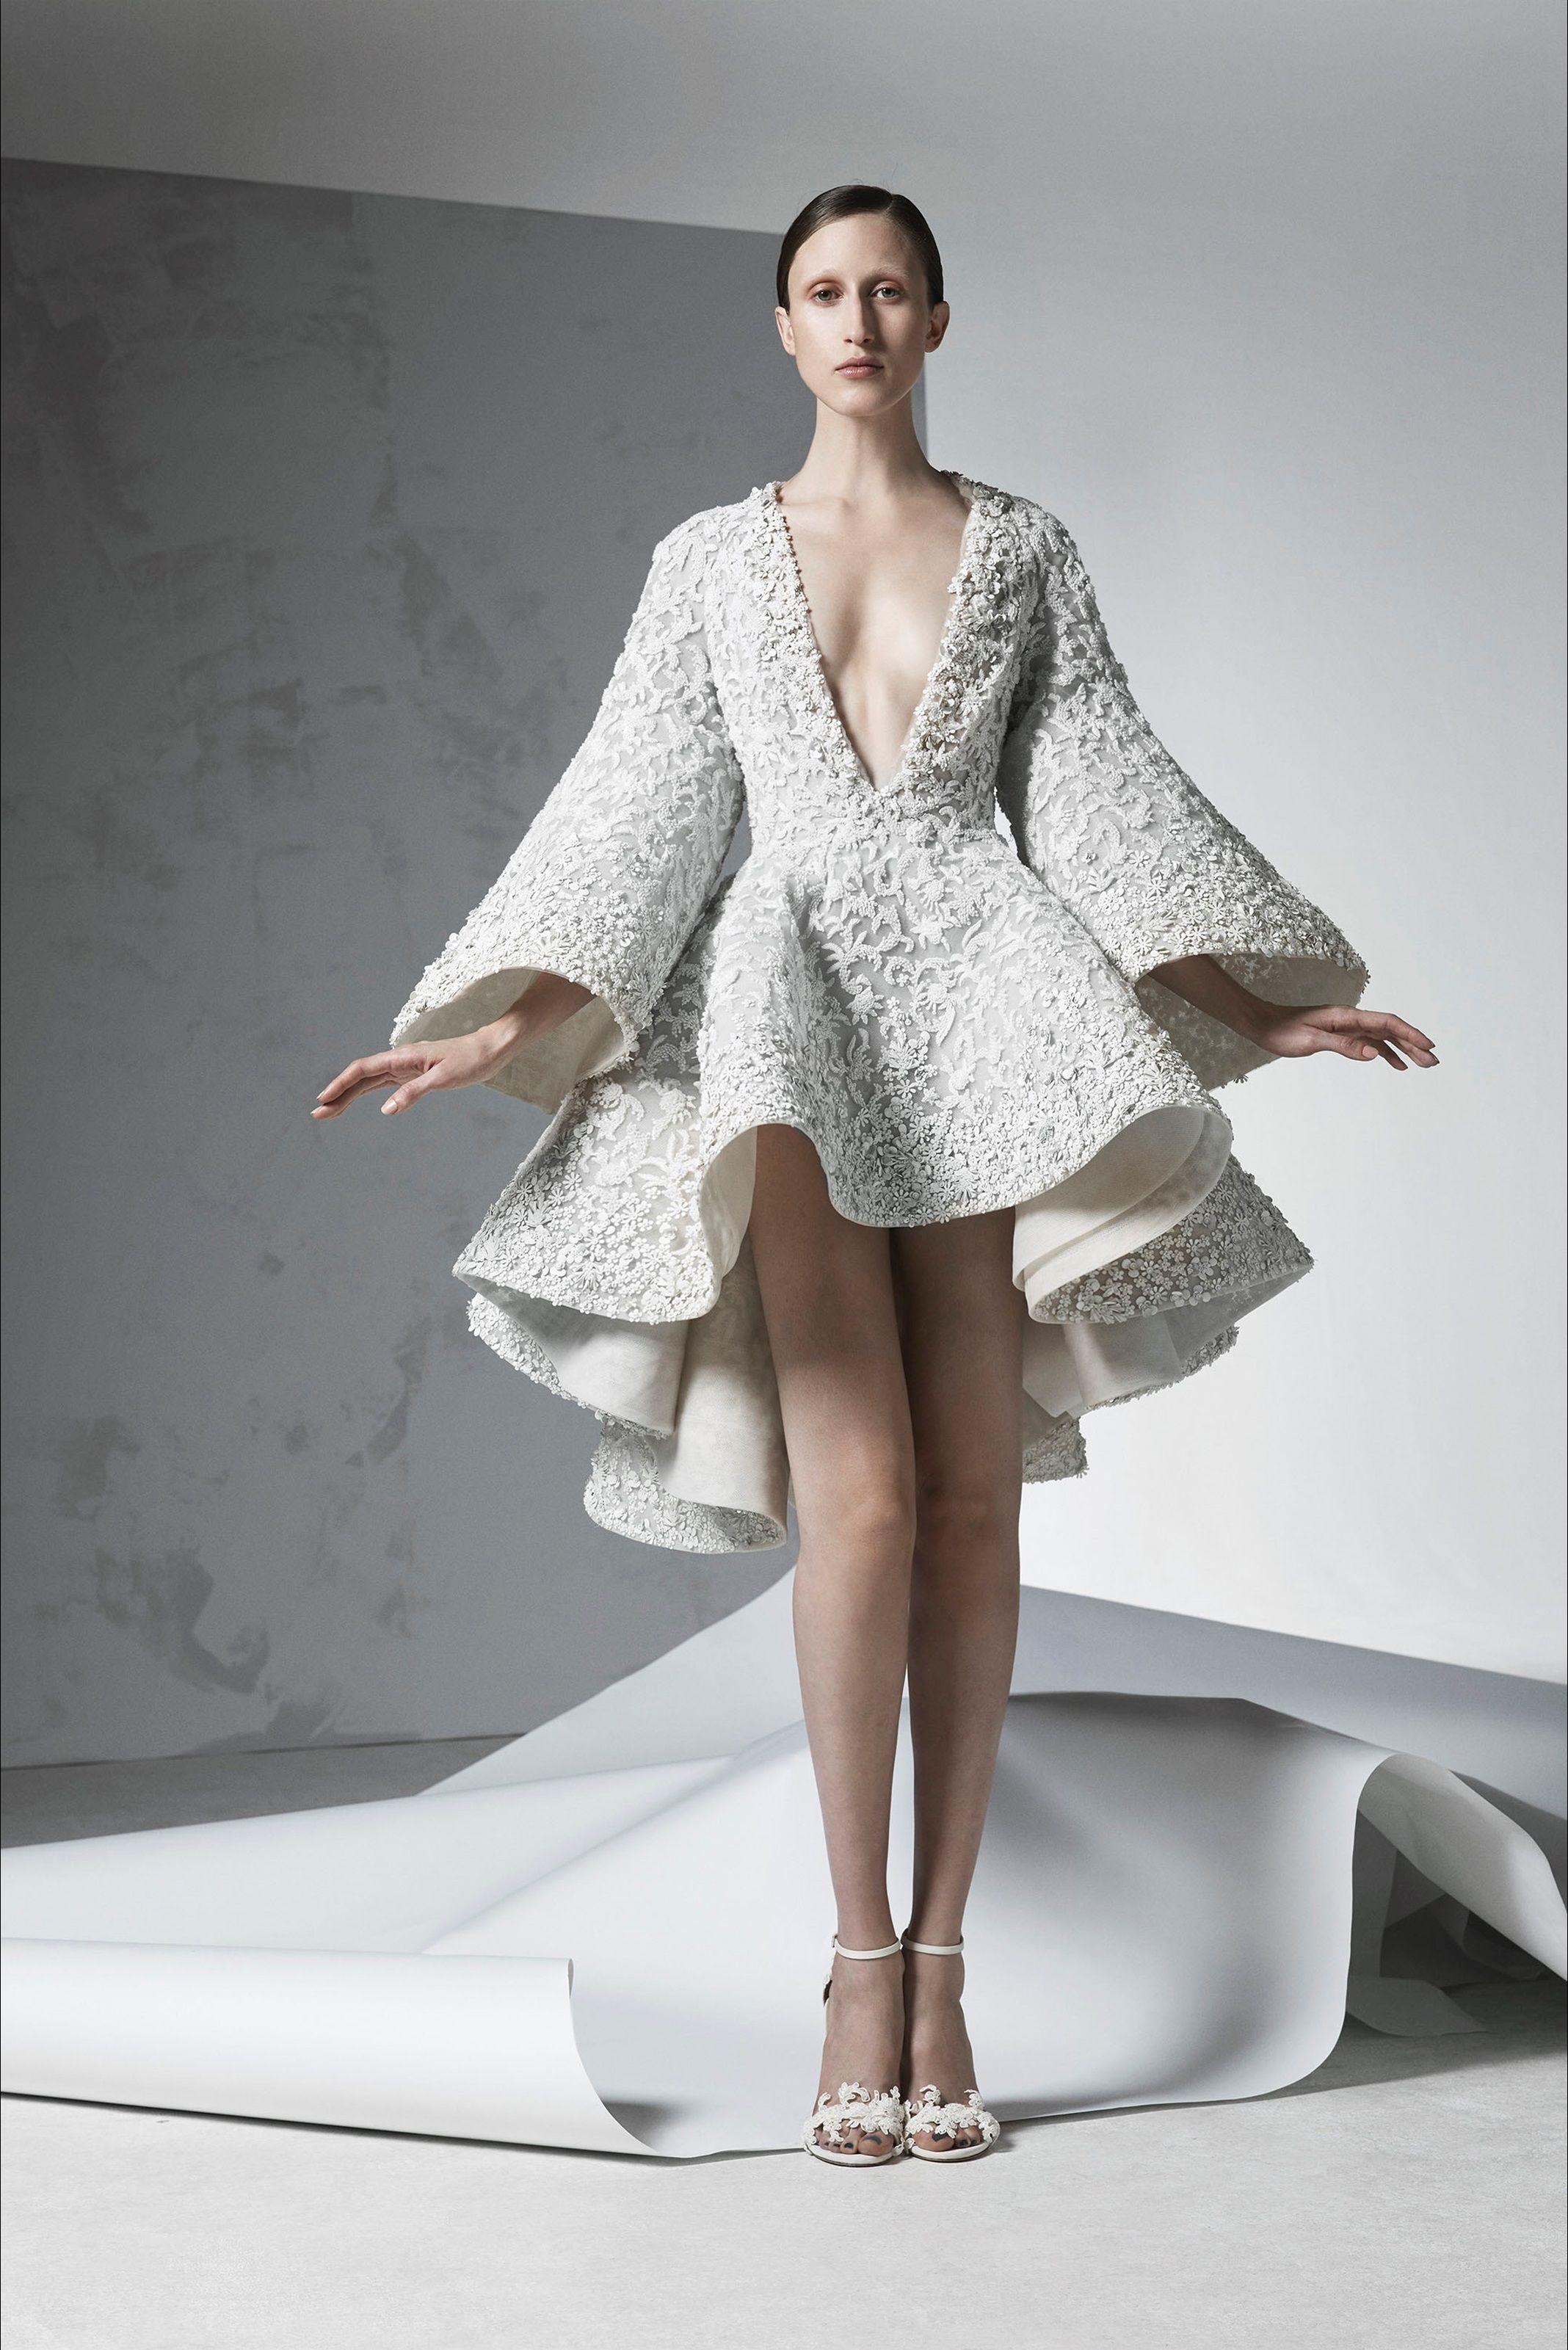 39aea7beae55 Sfilata Ashi Studio Parigi - Alta Moda Autunno-Inverno 2016-17 - Vogue